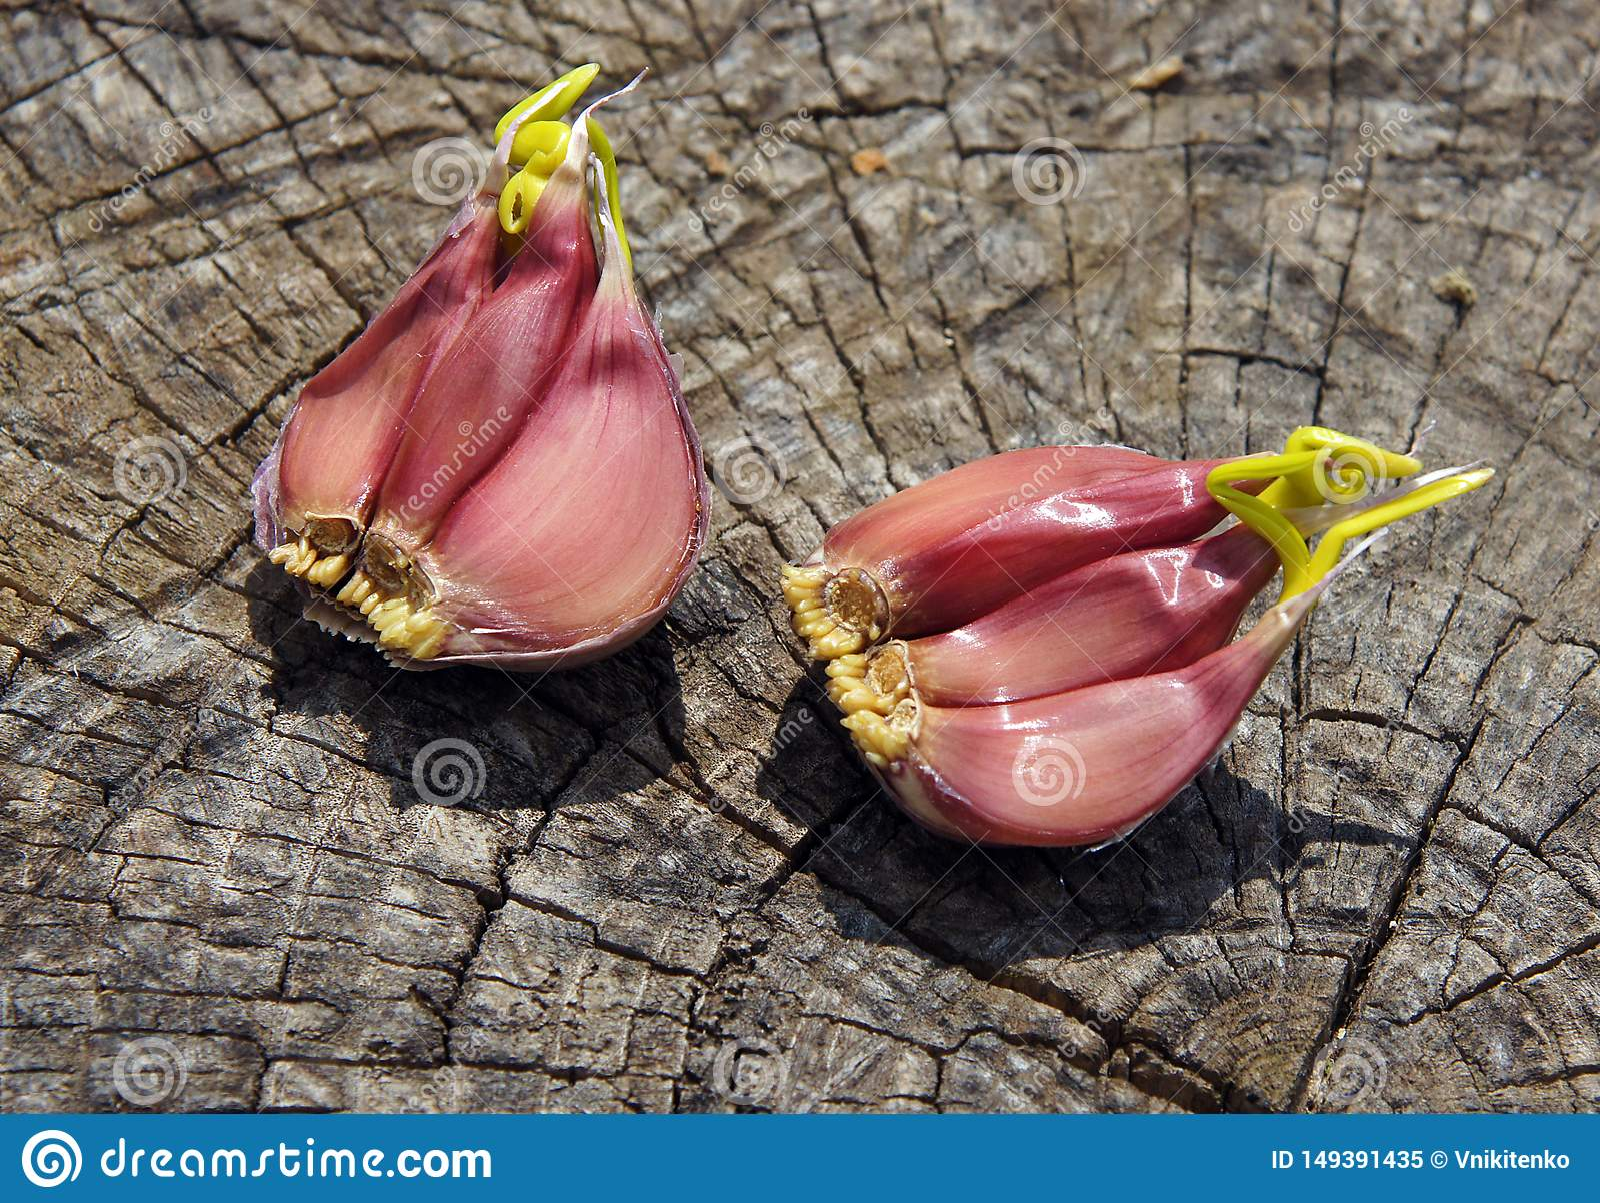 Garlic starts to sprout